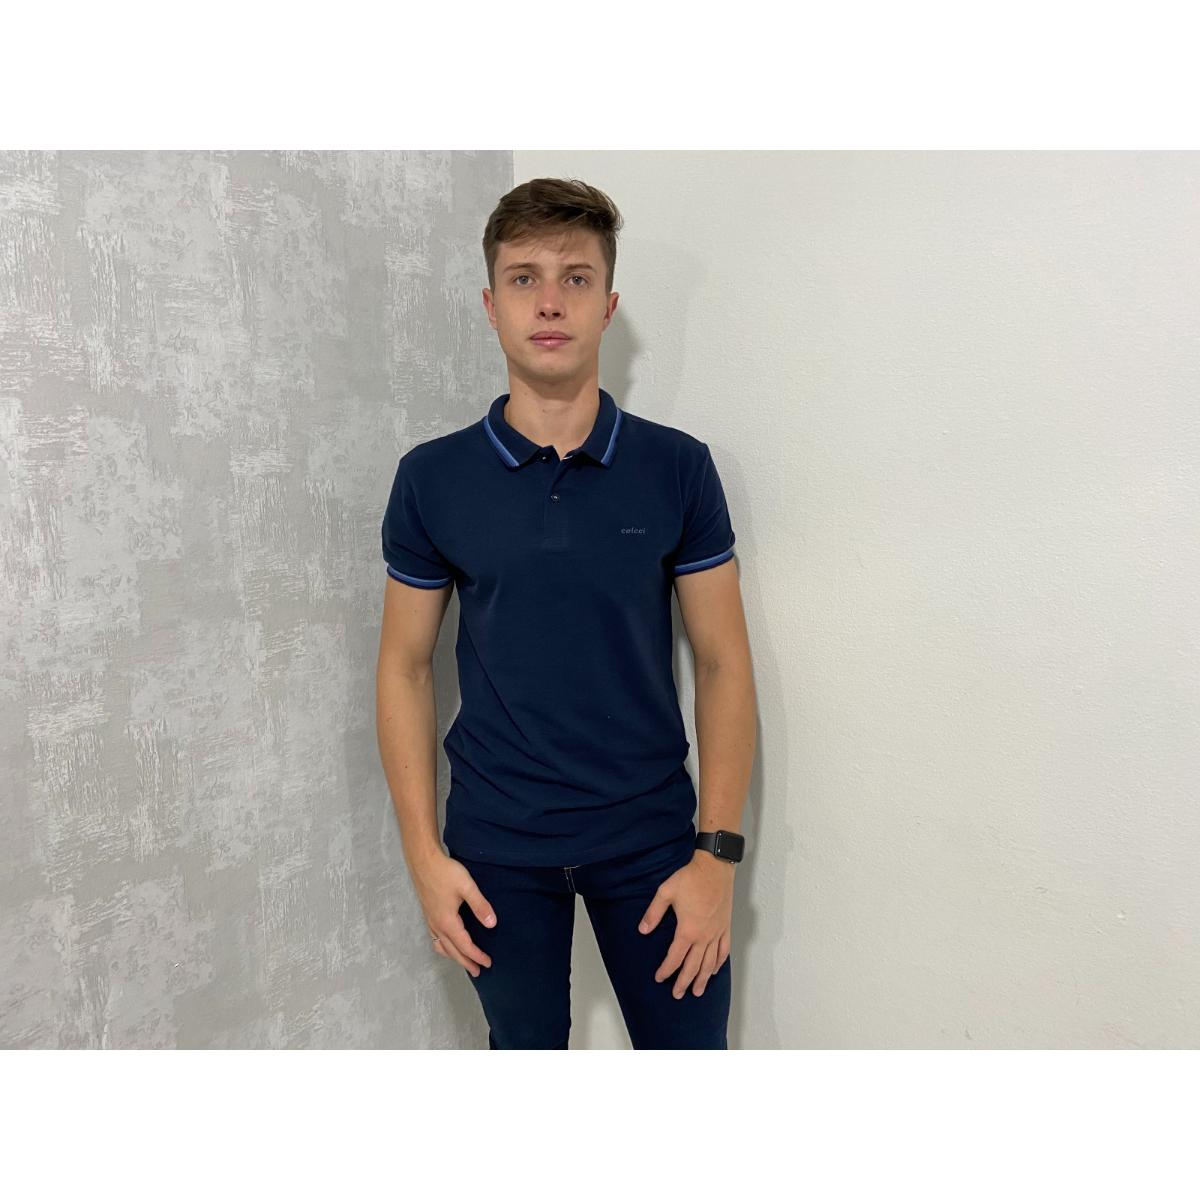 Camiseta Masculina Colcci 250102451 33664 Marinho